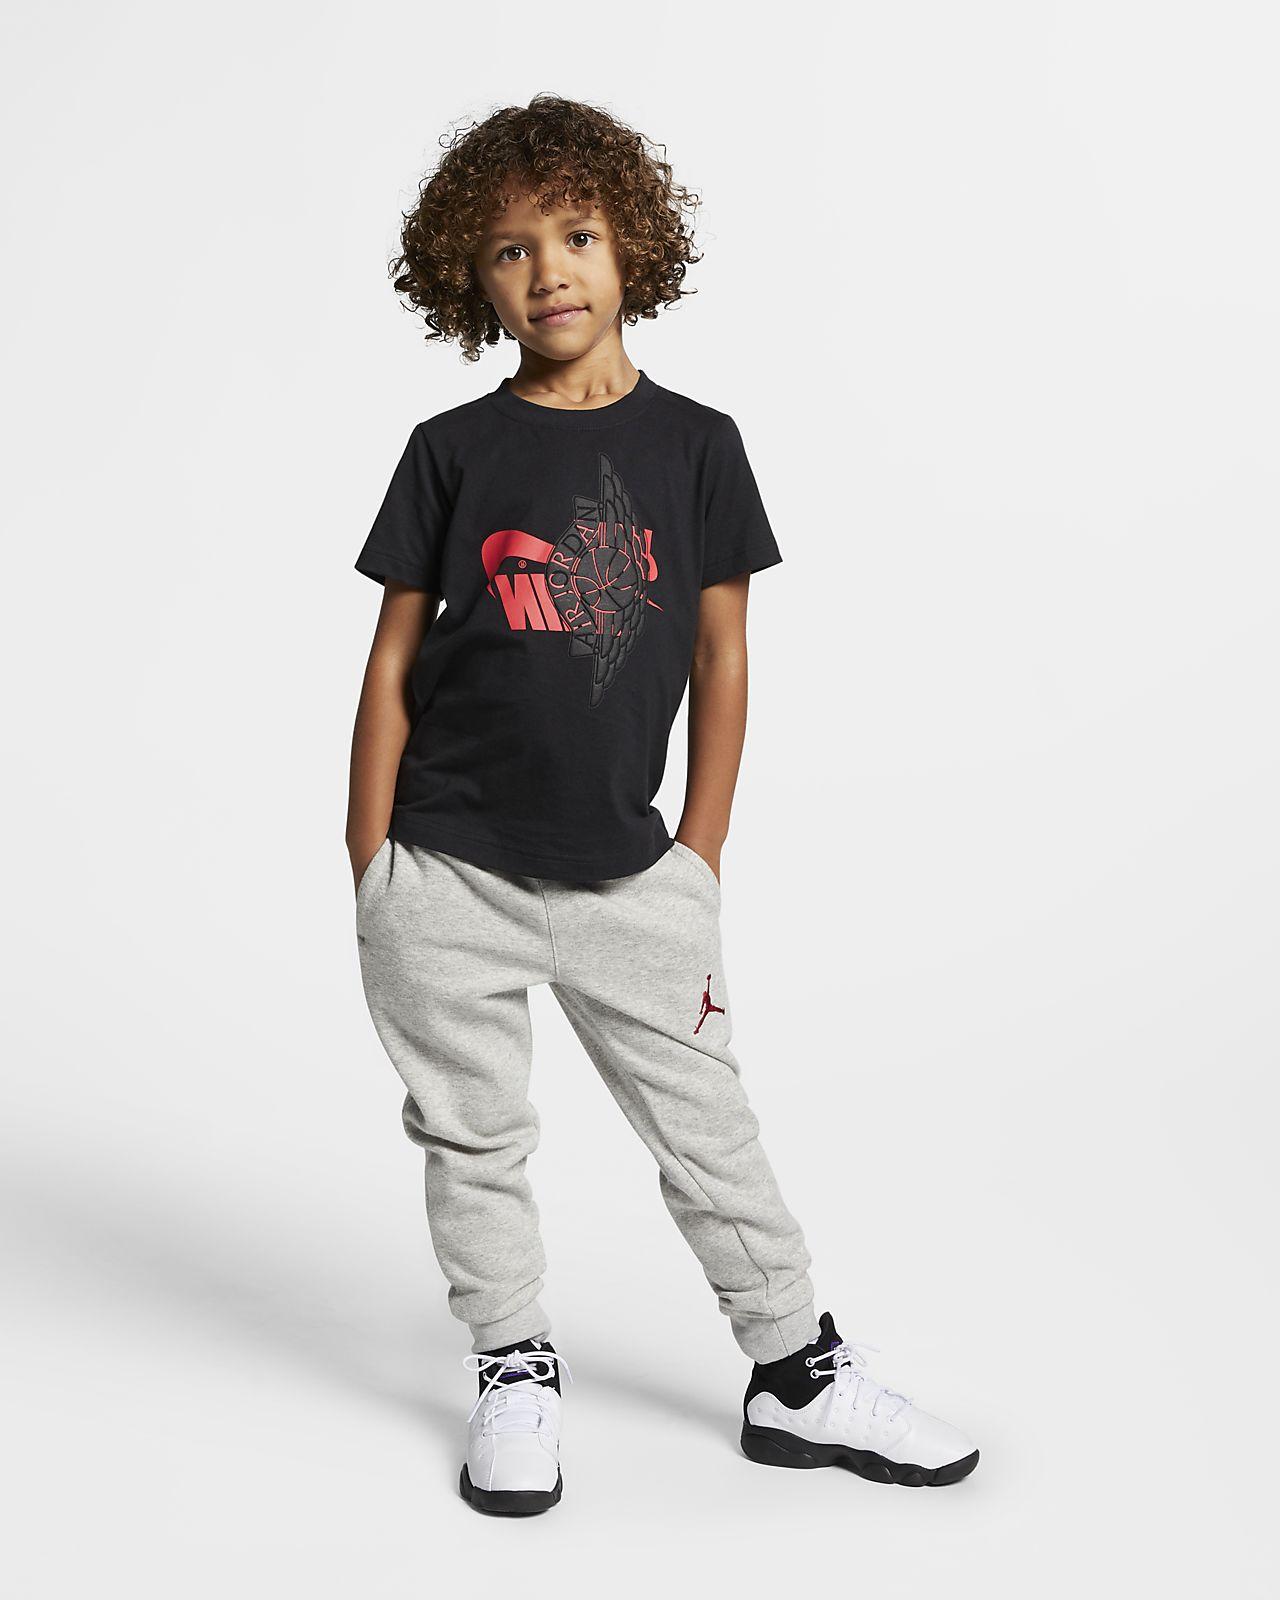 7a6805dd6d7 Jordan Sportswear Wings Camiseta - Niño a pequeño a. Nike.com ES